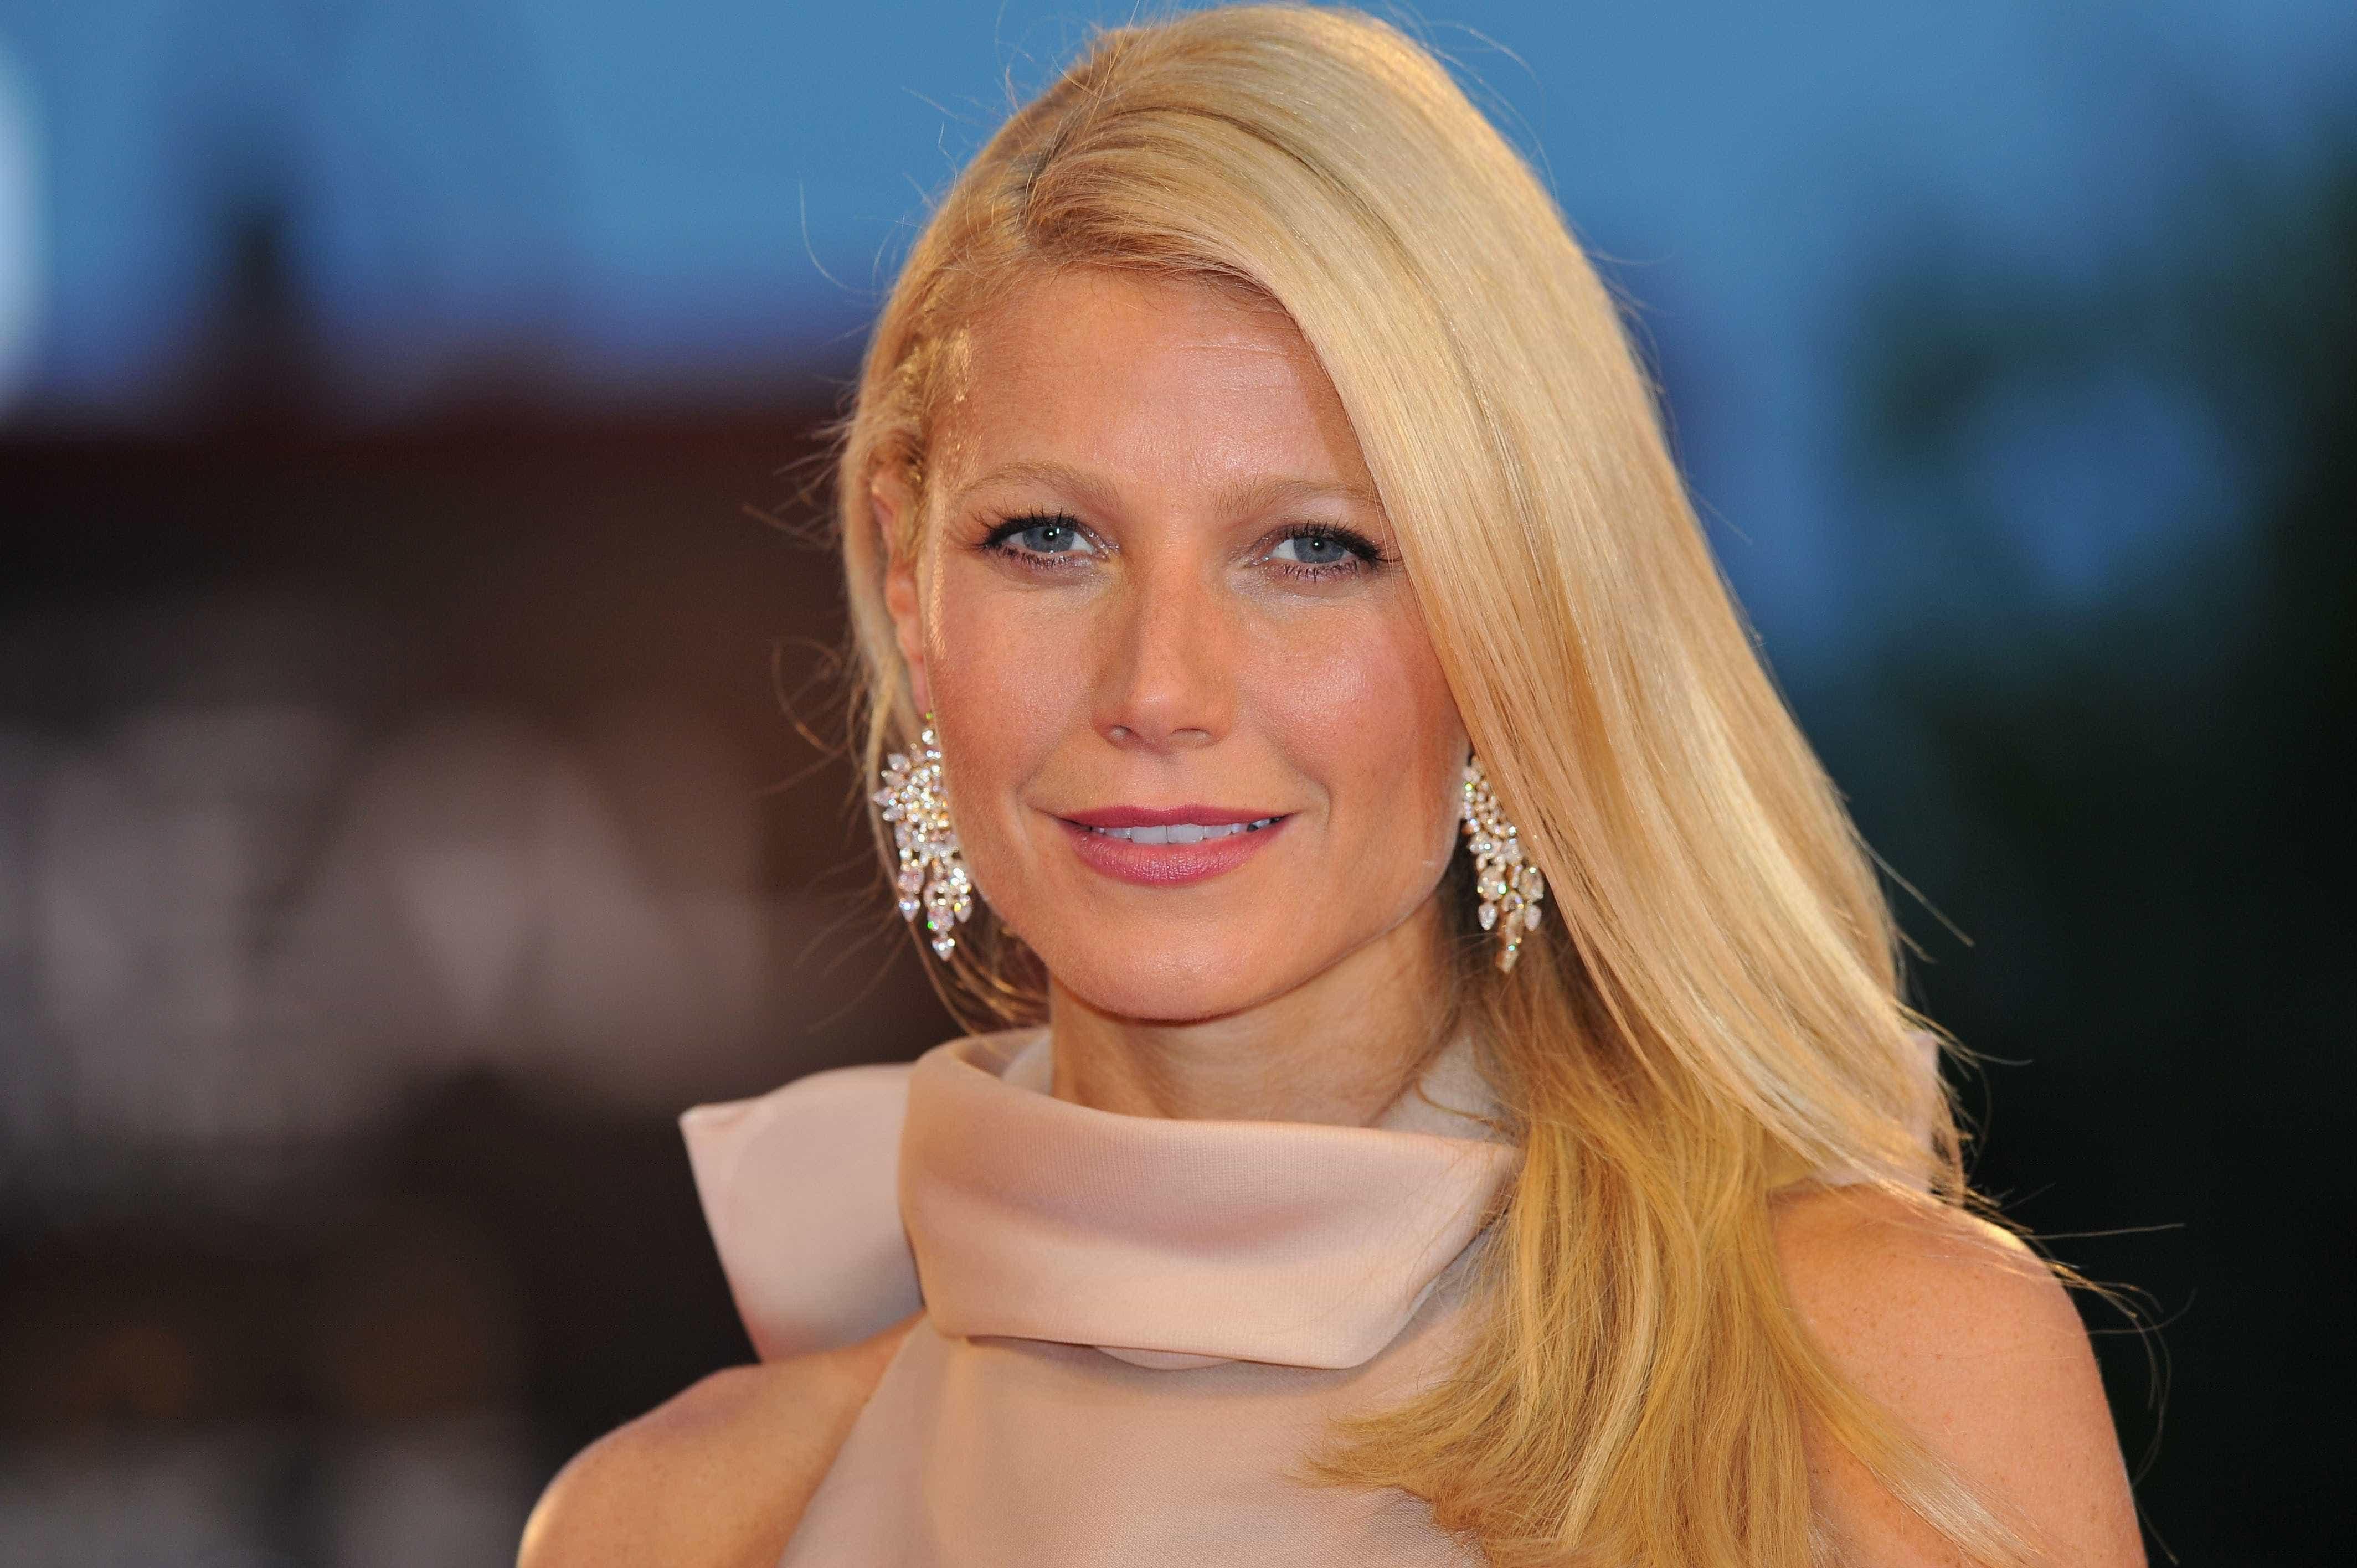 Aos 46 anos, Gwyneth Paltrow posa em biquíni nas redes sociais